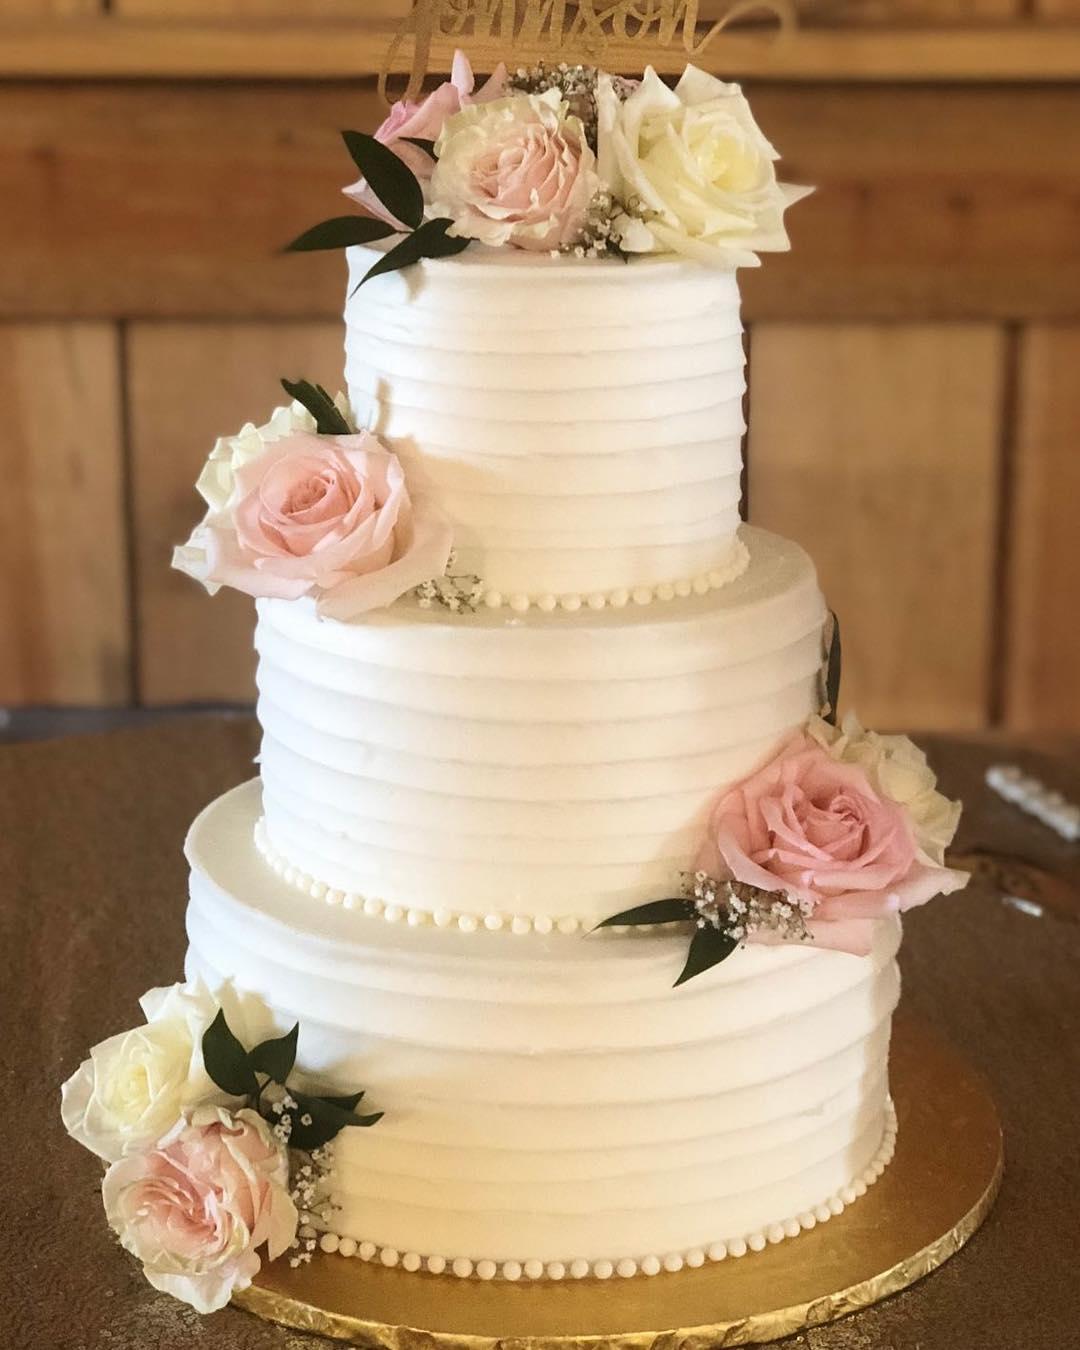 Congratulations Mr. and Mrs. Johnson! #weddingcake #cakestagram #cakesofinstagram